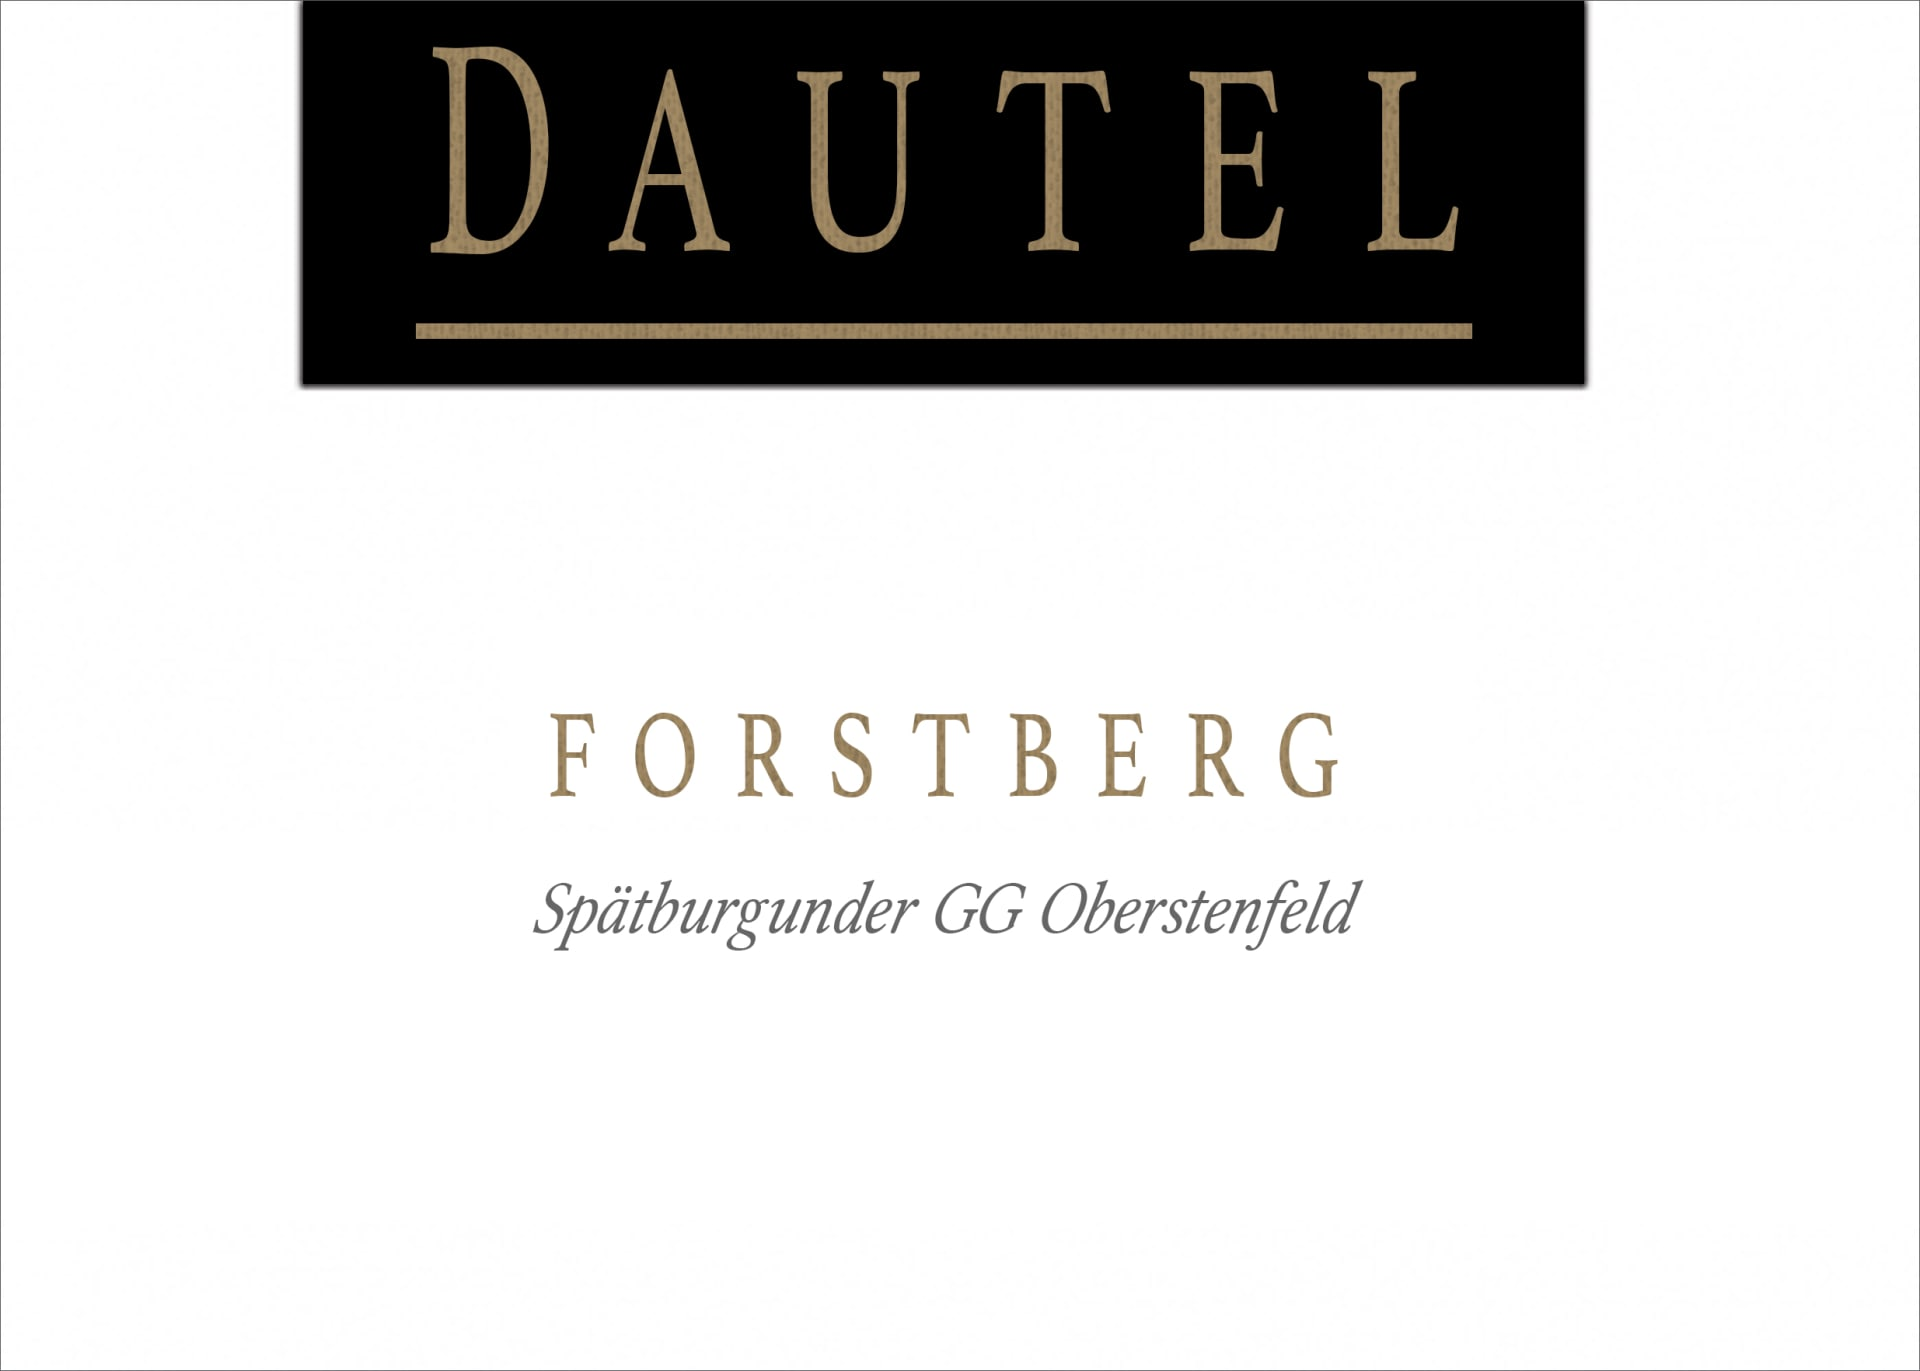 Dautel Spätburgunder